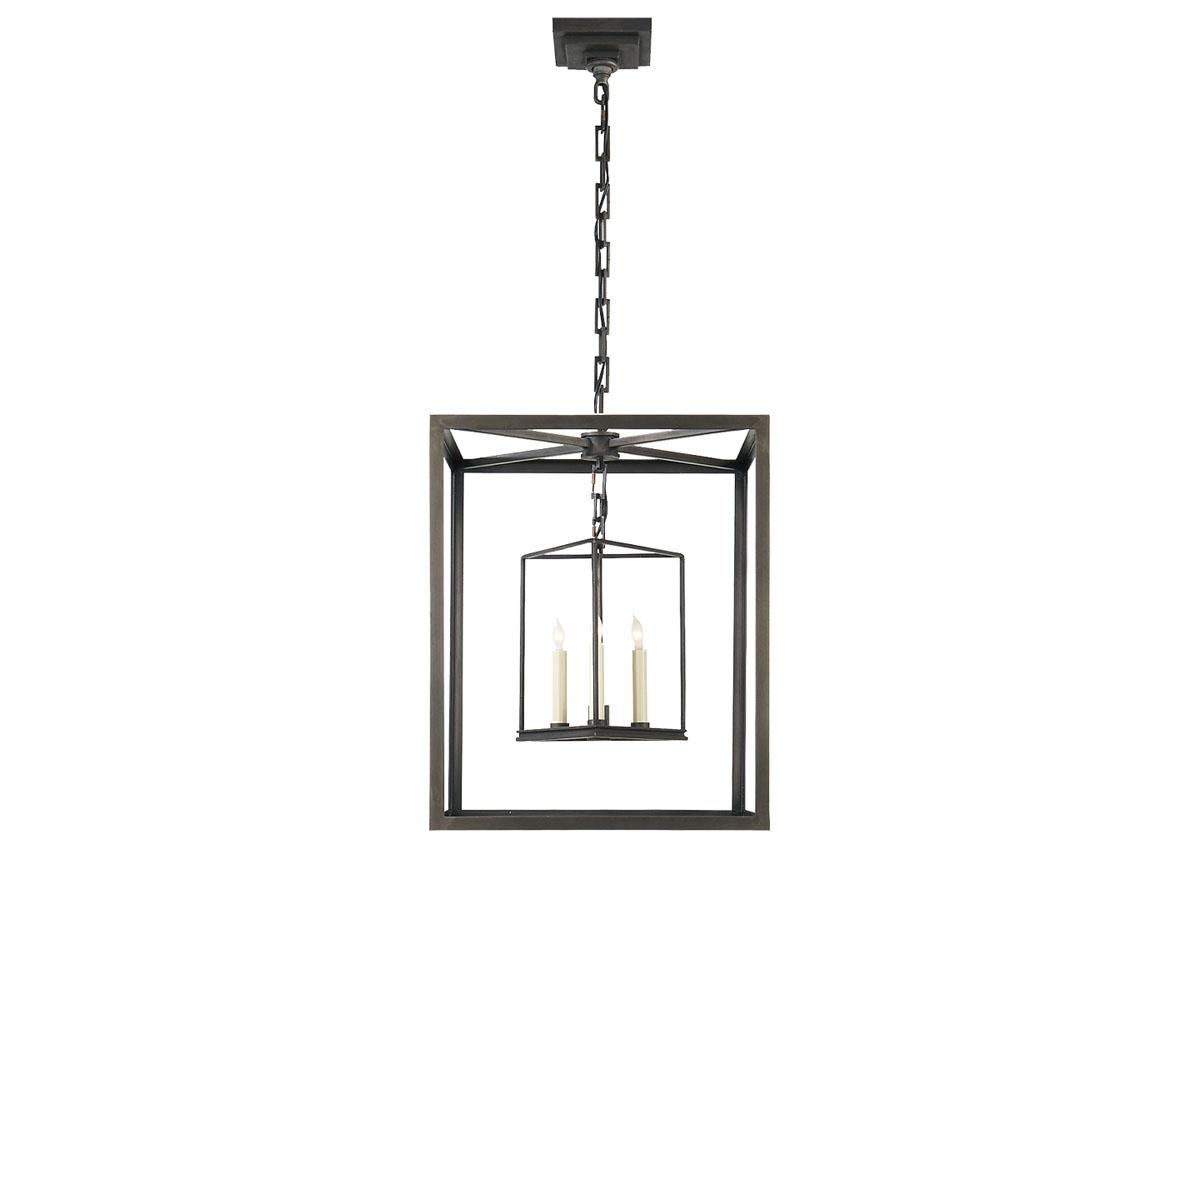 Visual Comfort Osborne Lanterns Ceiling Mounts